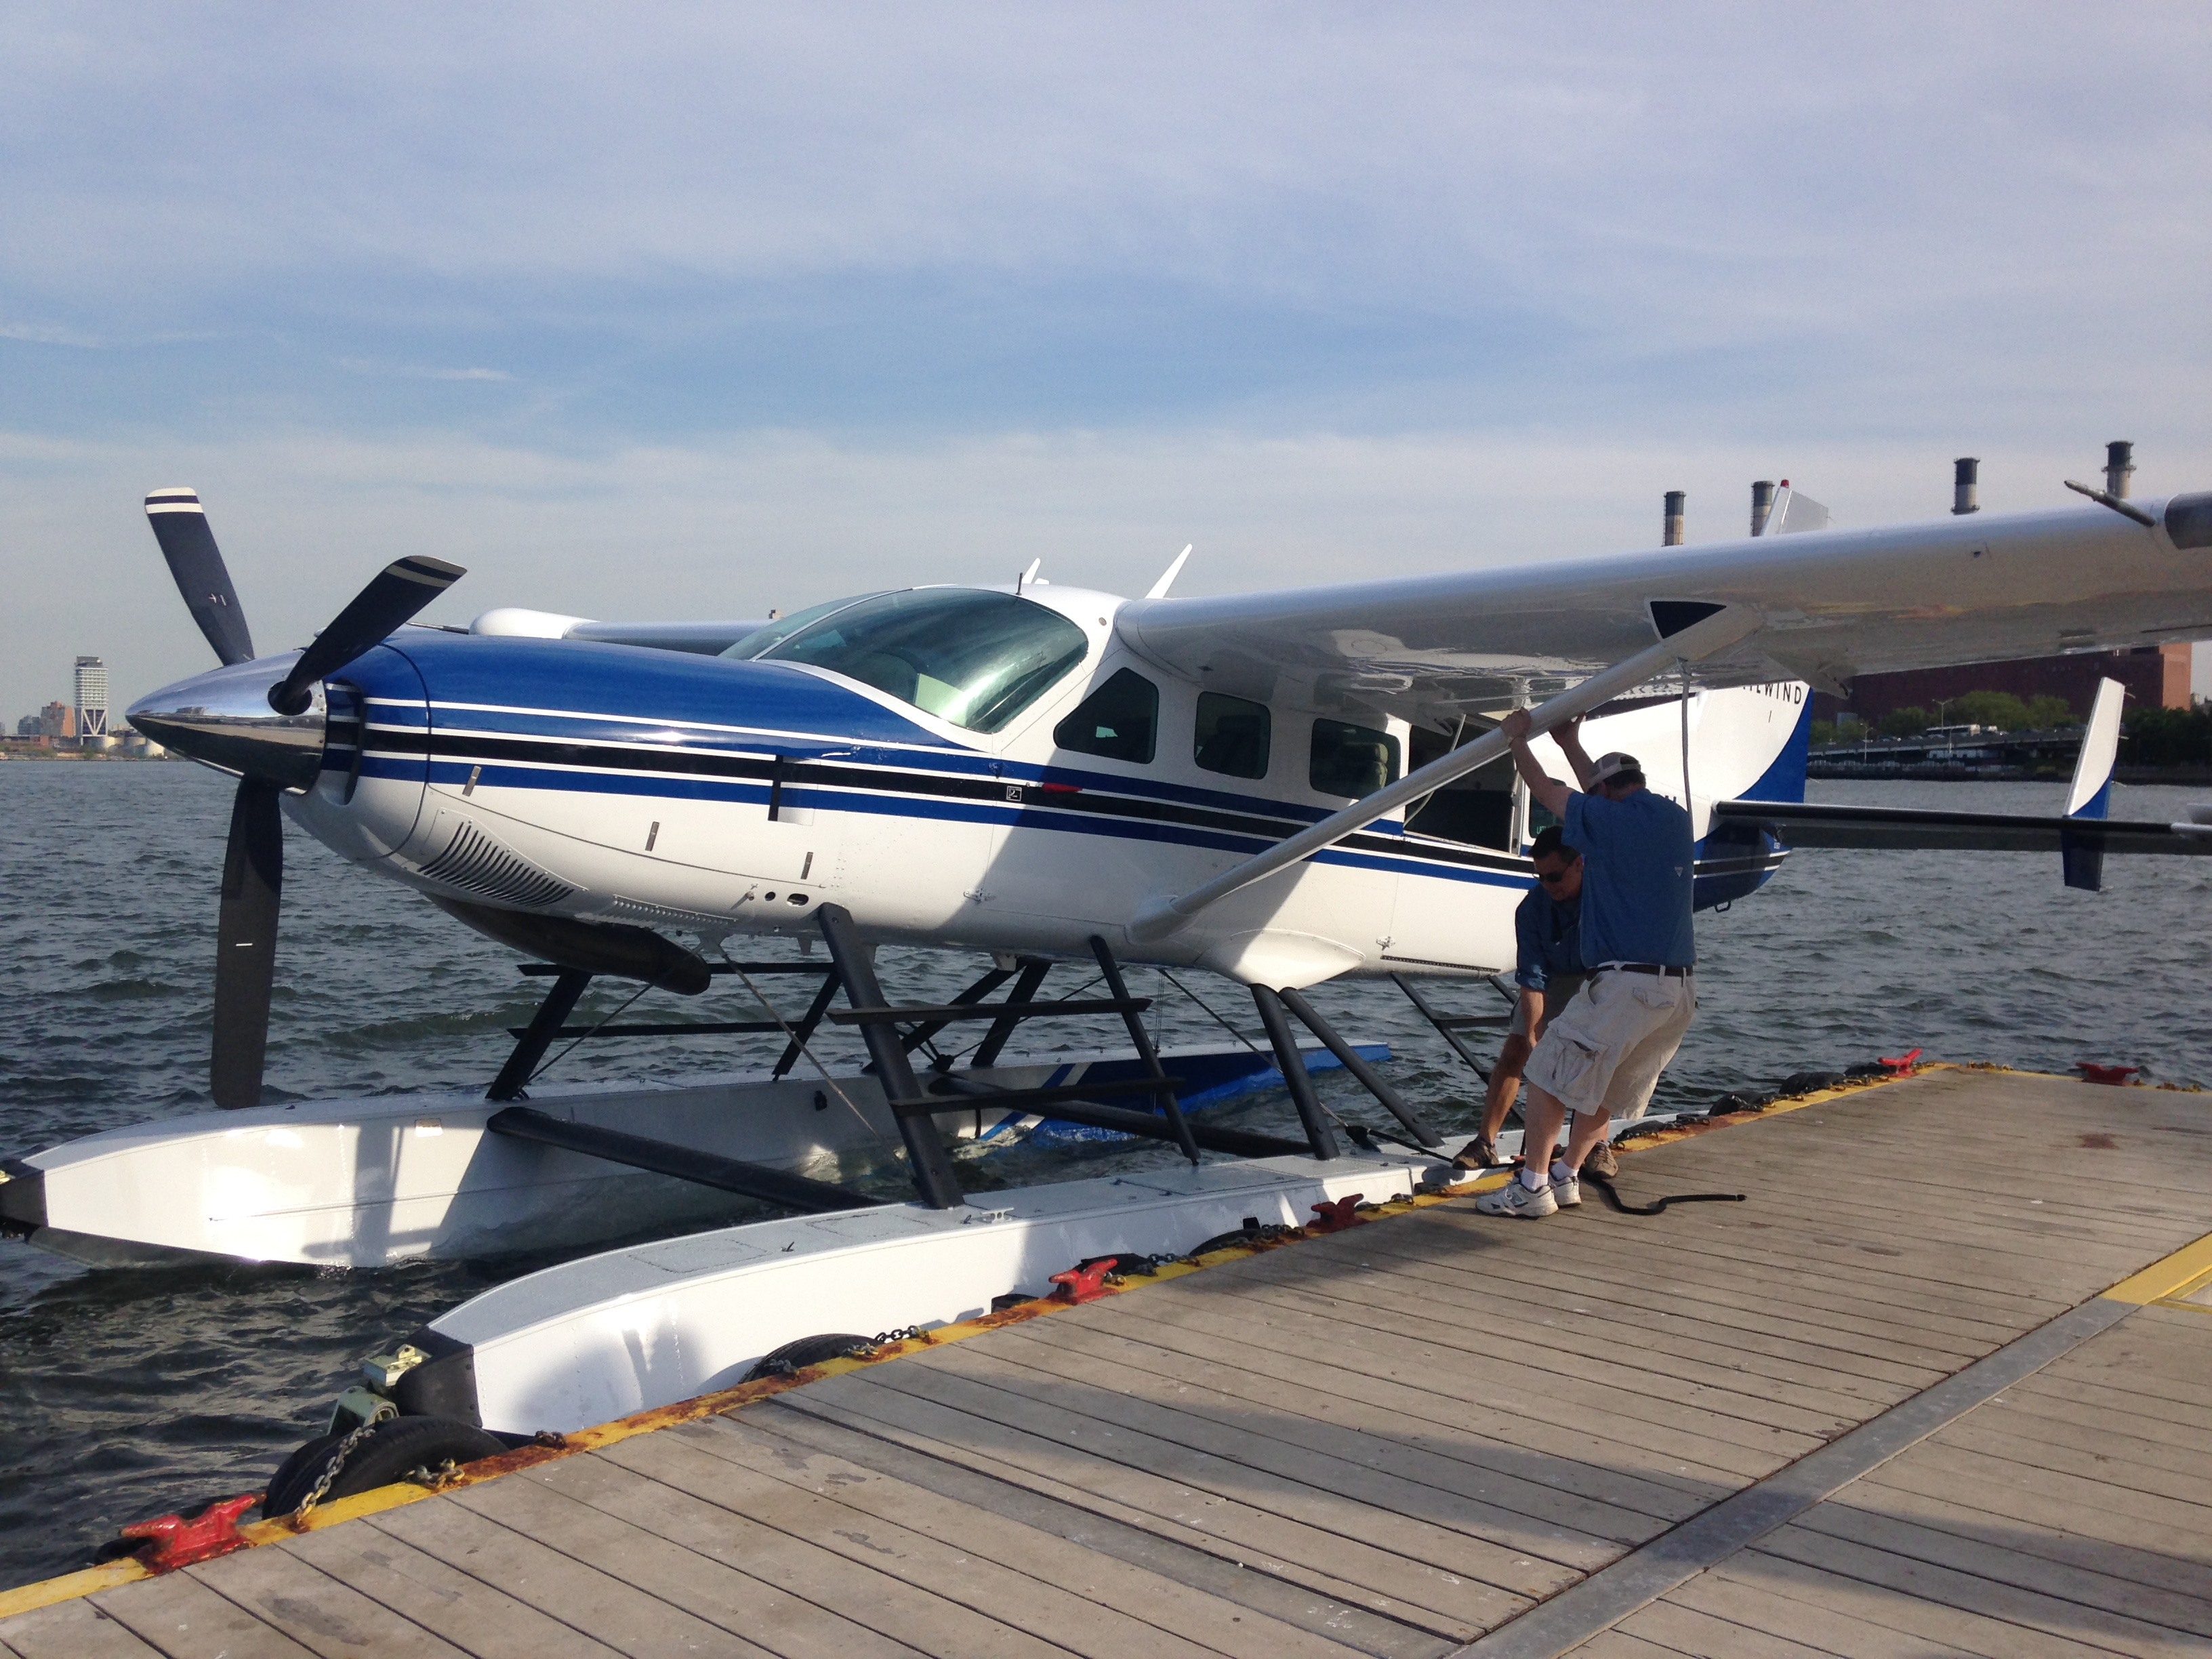 https://buildingmybento.files.wordpress.com/2016/05/tailwind-seaplane-manhattan-new-york-east-river-to-stratford-bridgeport-connecticut-4.jpg